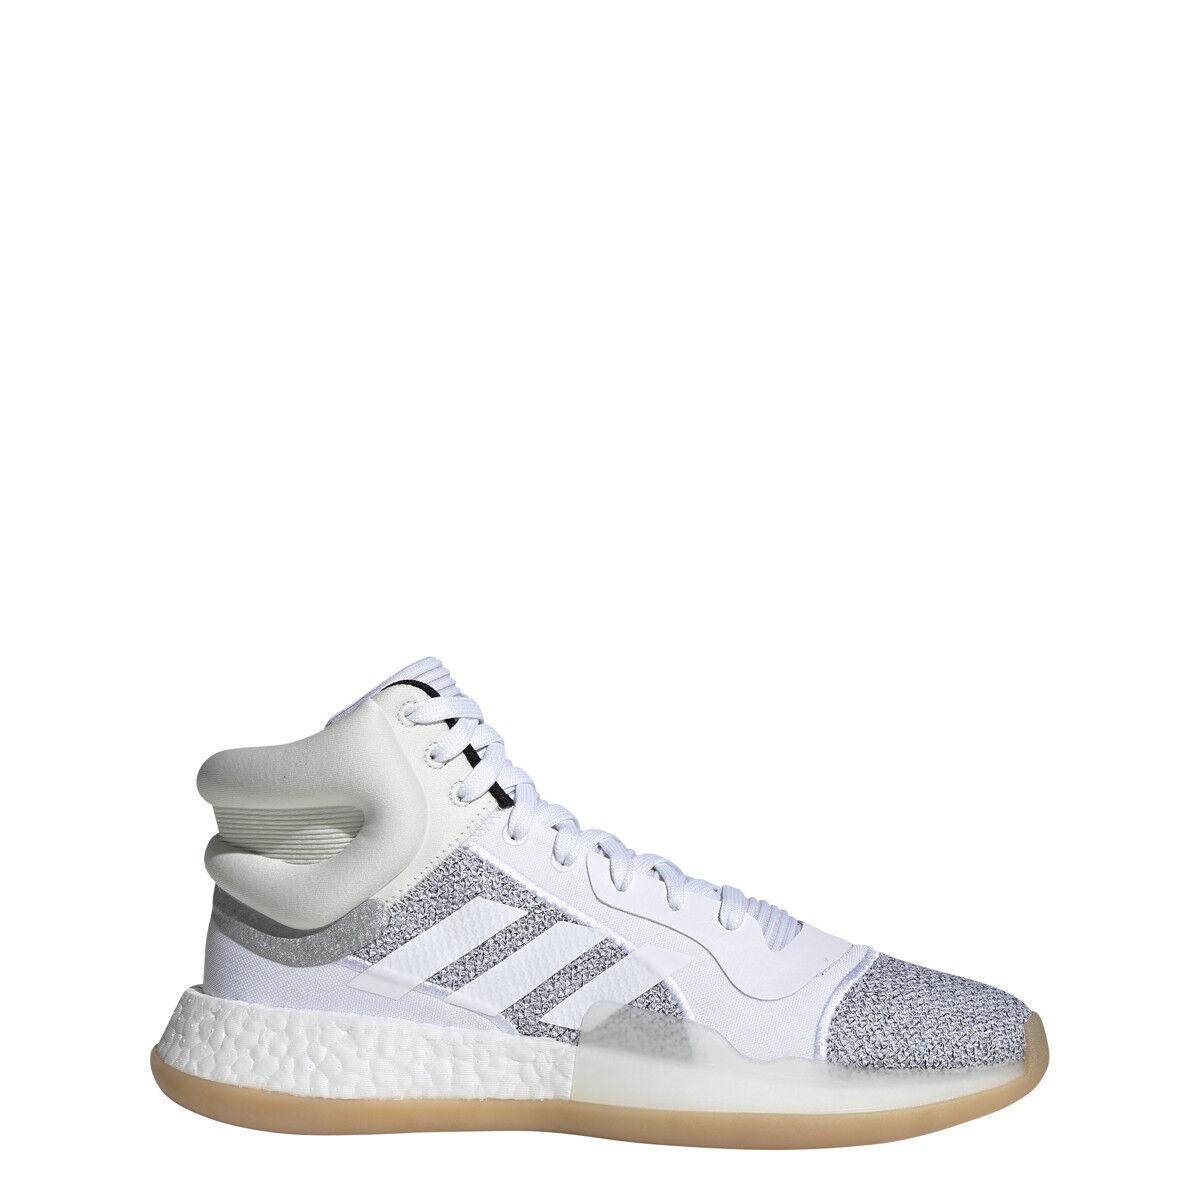 Adidas Adidas Adidas Men's Marquee Boost Basketball scarpe bianca - BB9299 79b76c